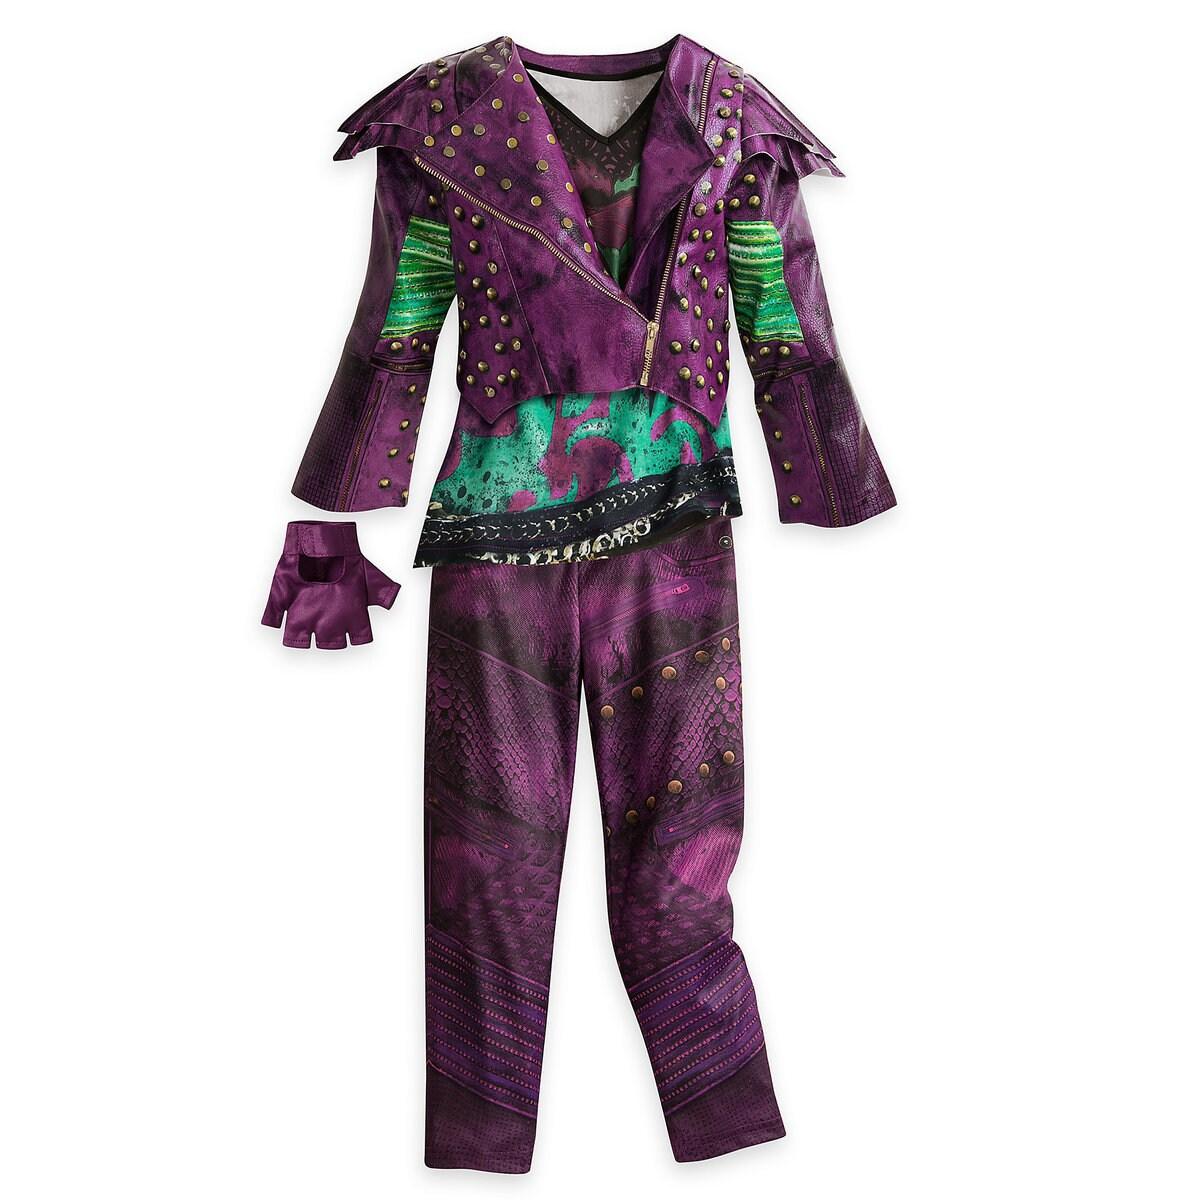 Mal Costume for Kids - Descendants 2 | shopDisney